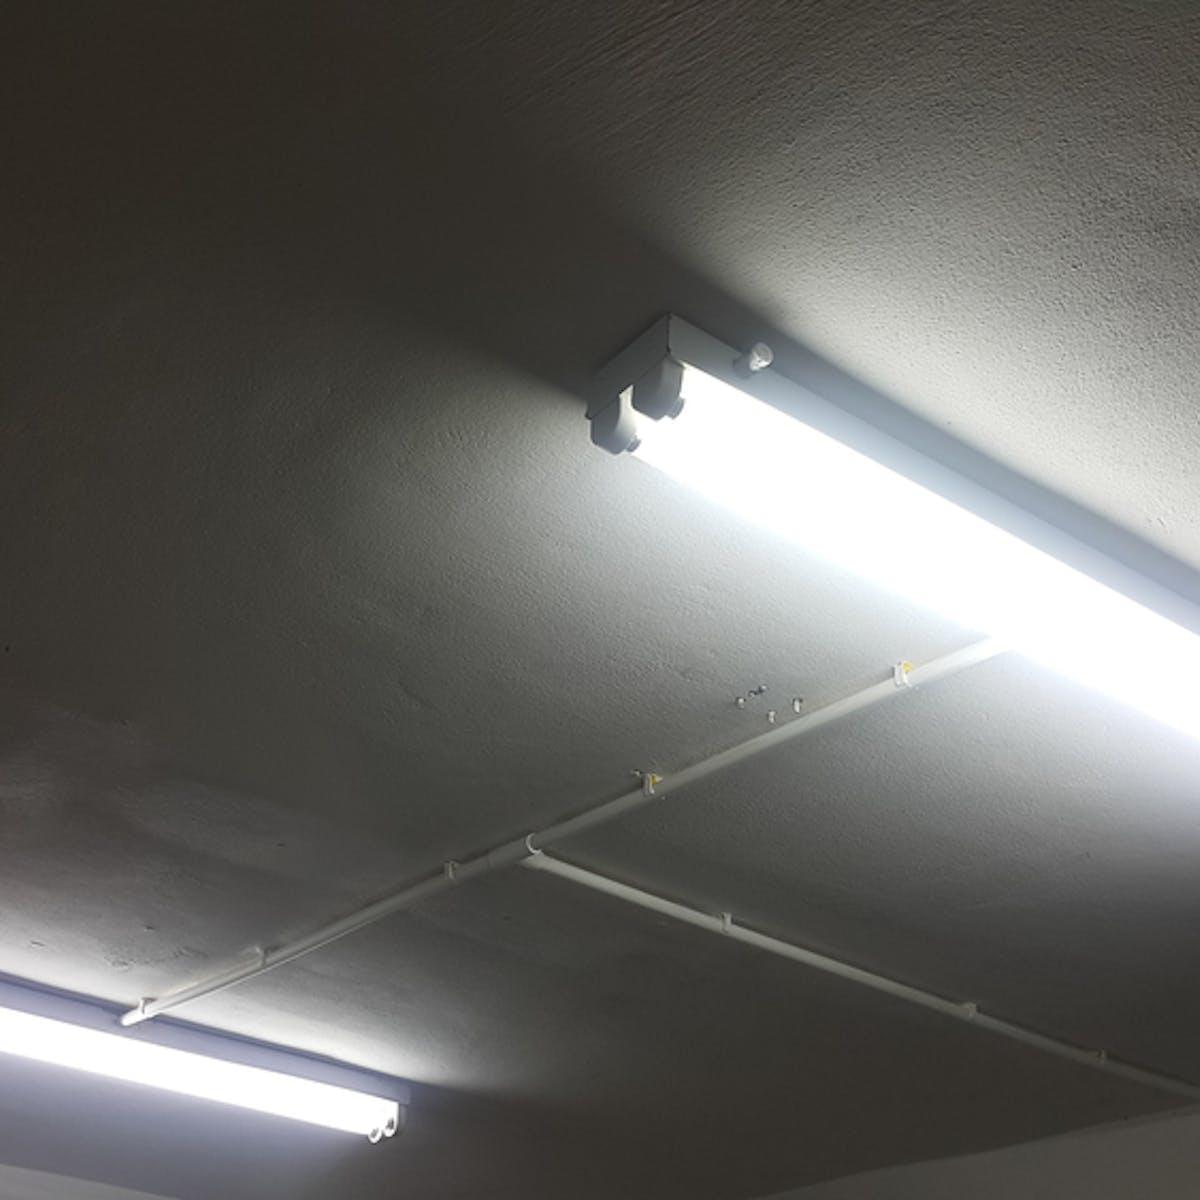 Fluorescent Lights Emit Uv